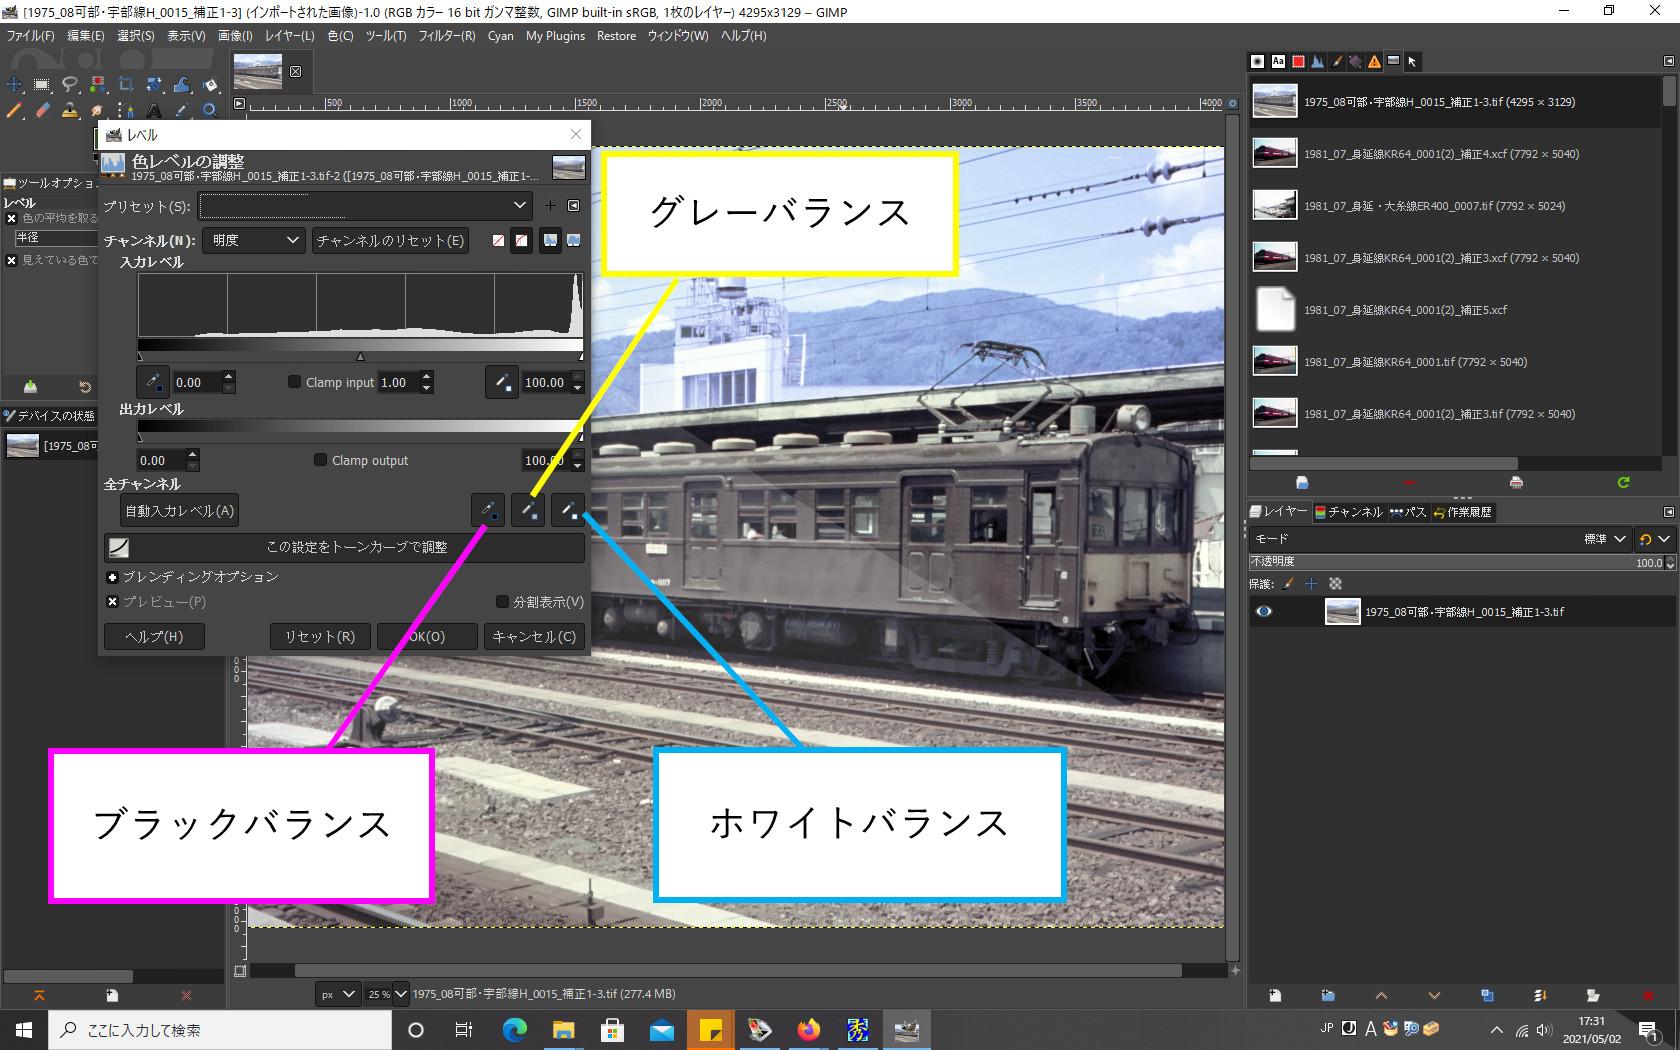 f:id:yasuo_ssi:20210502174445j:plain